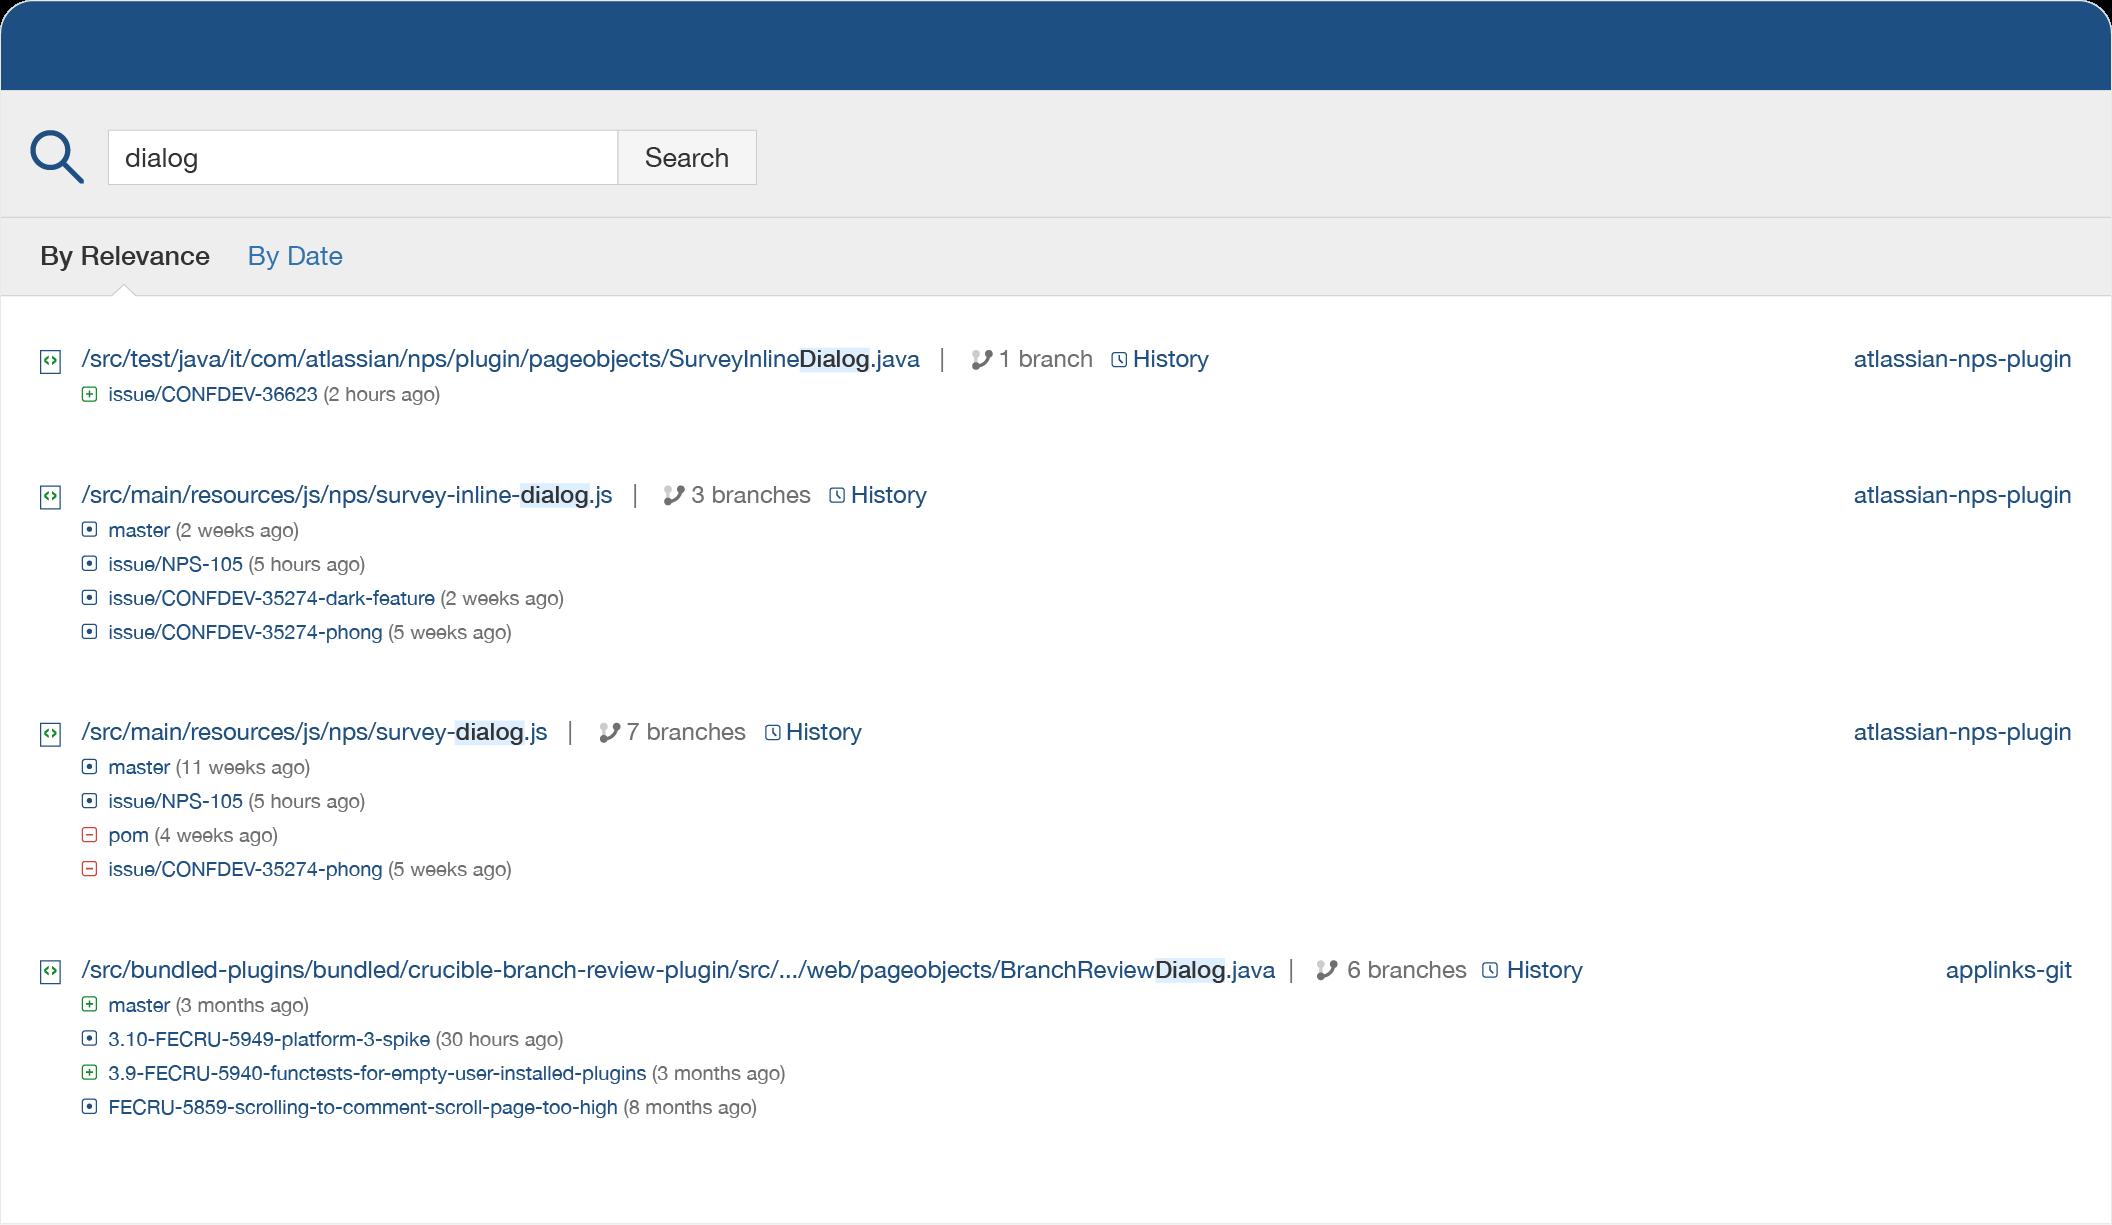 image de recherche de code